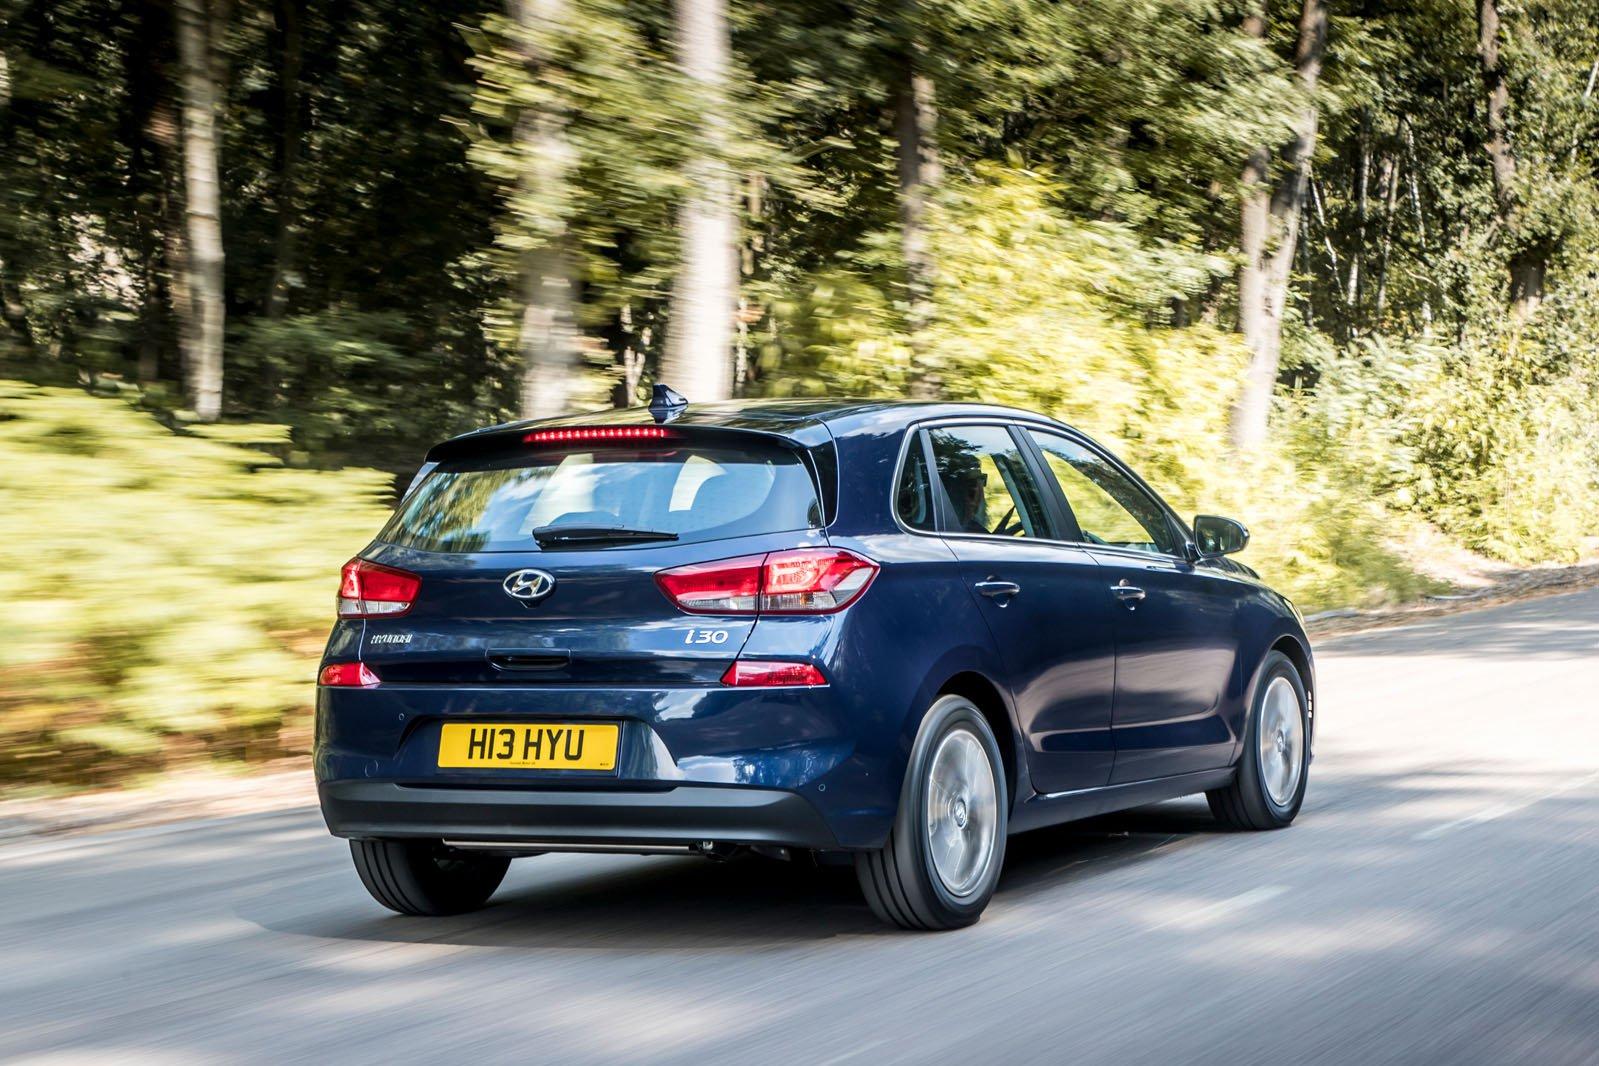 Hyundai i30 2019 RHD rear cornering shot